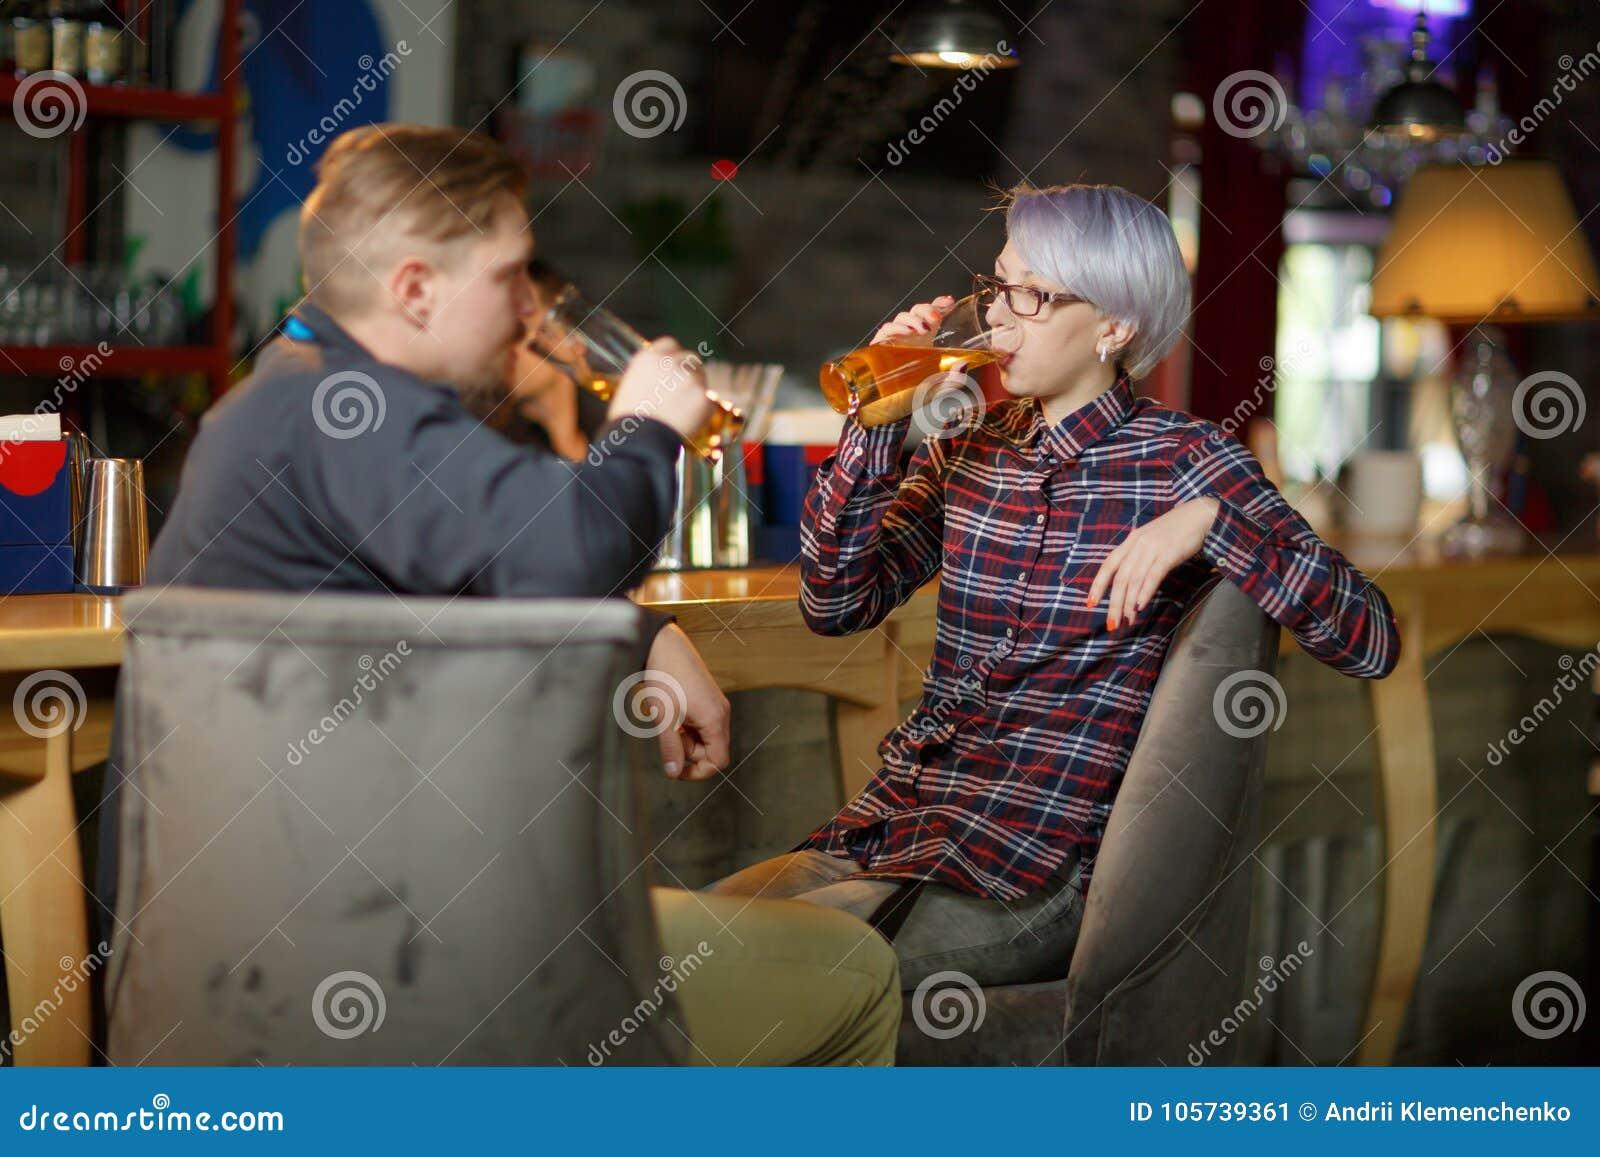 De kerels en een meisje drinken bierzitting in een bar binnen